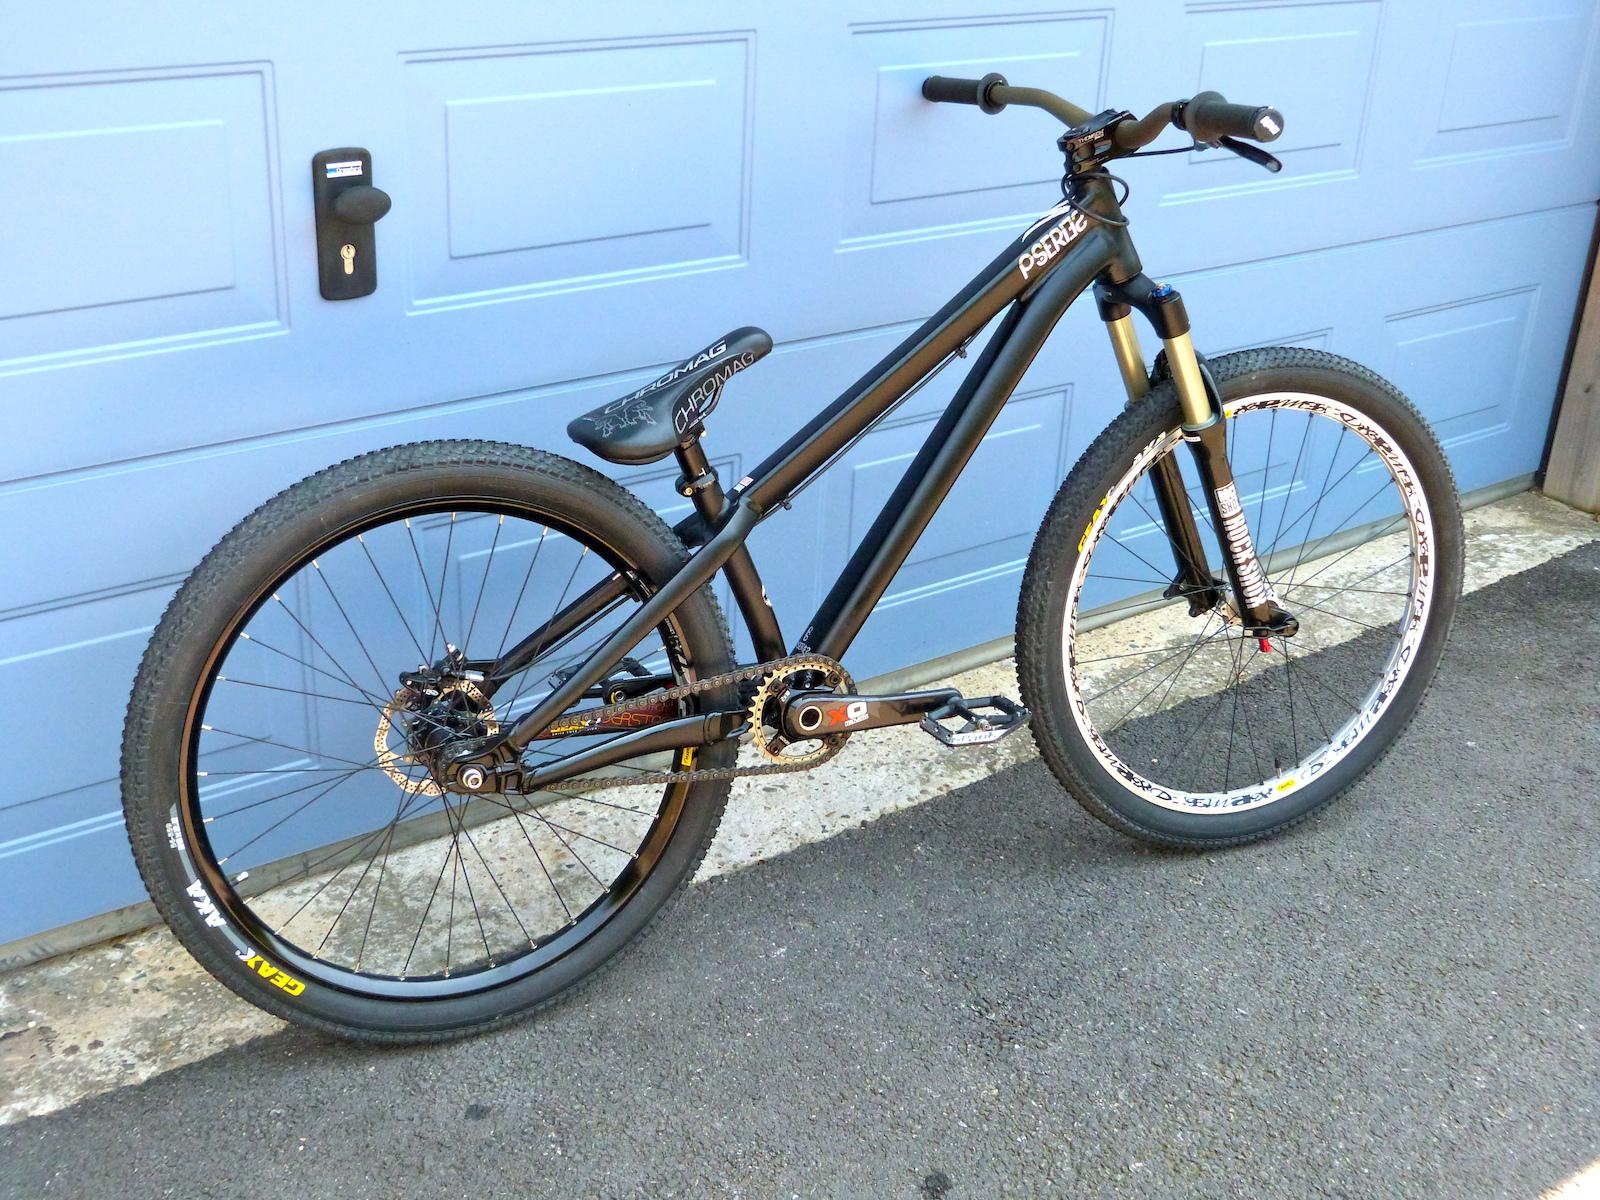 My specialized p3 2013, best dirt bike ever !!